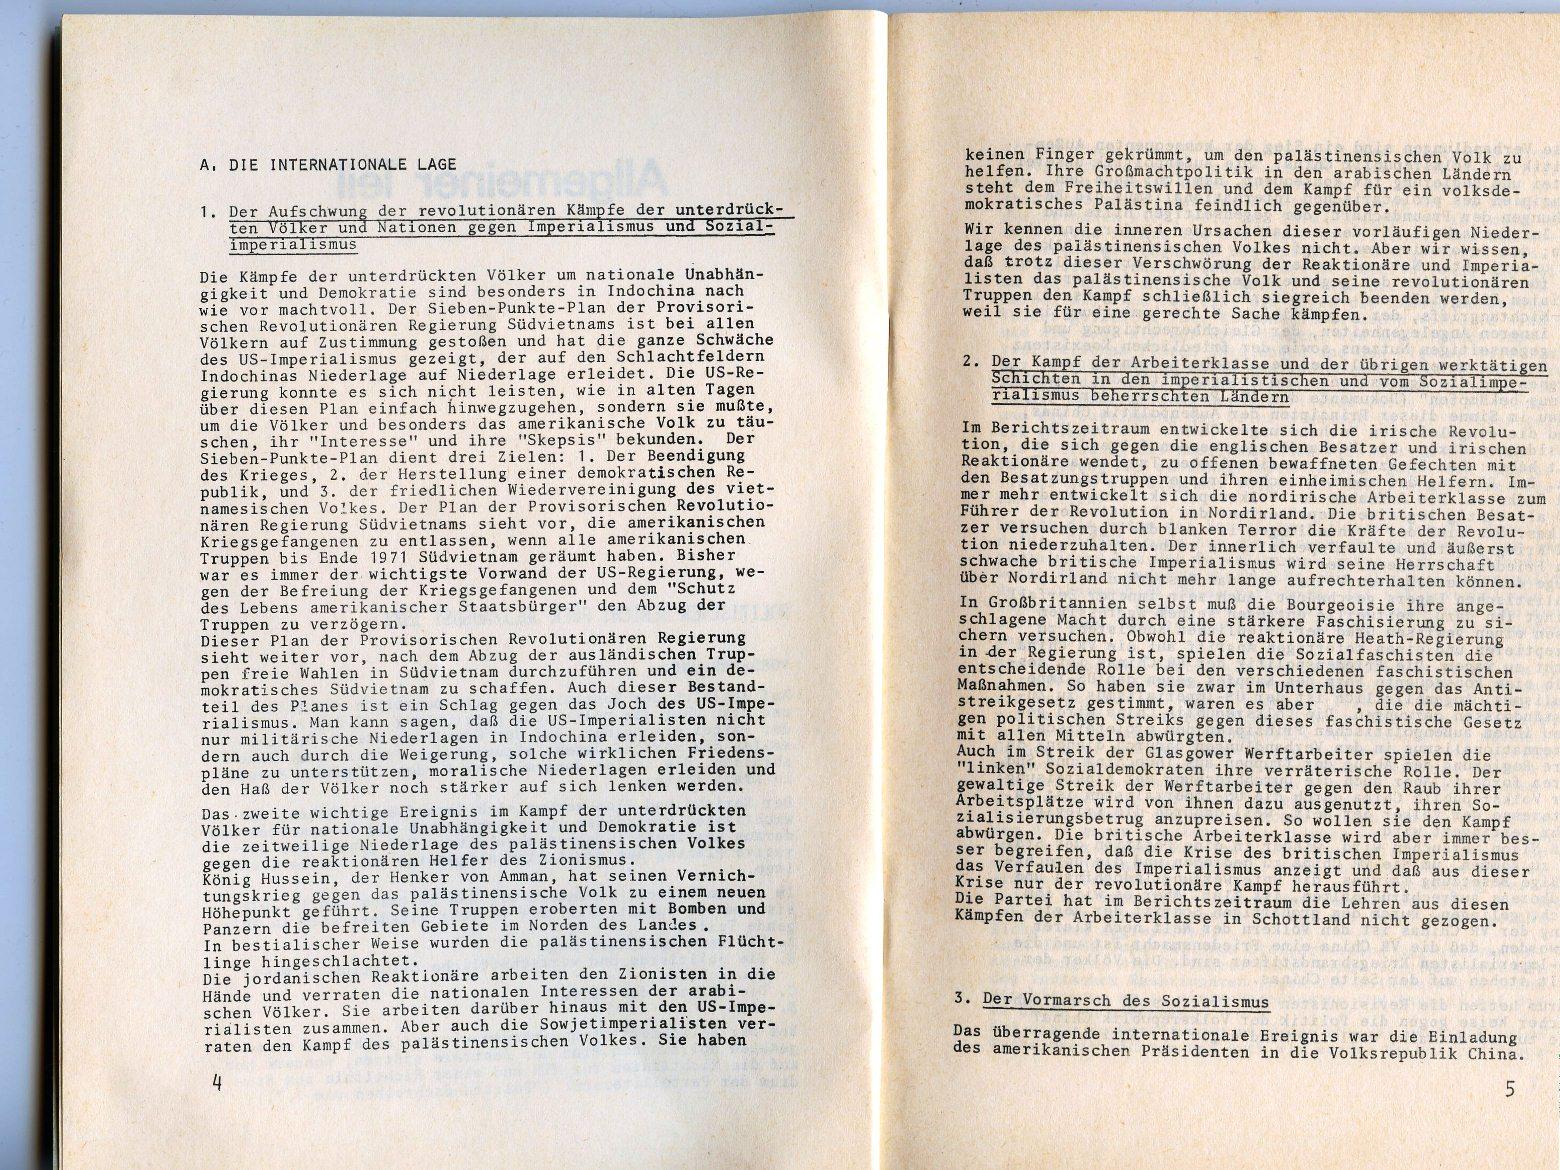 ZB_Parteiarbeiter_1971_07_04